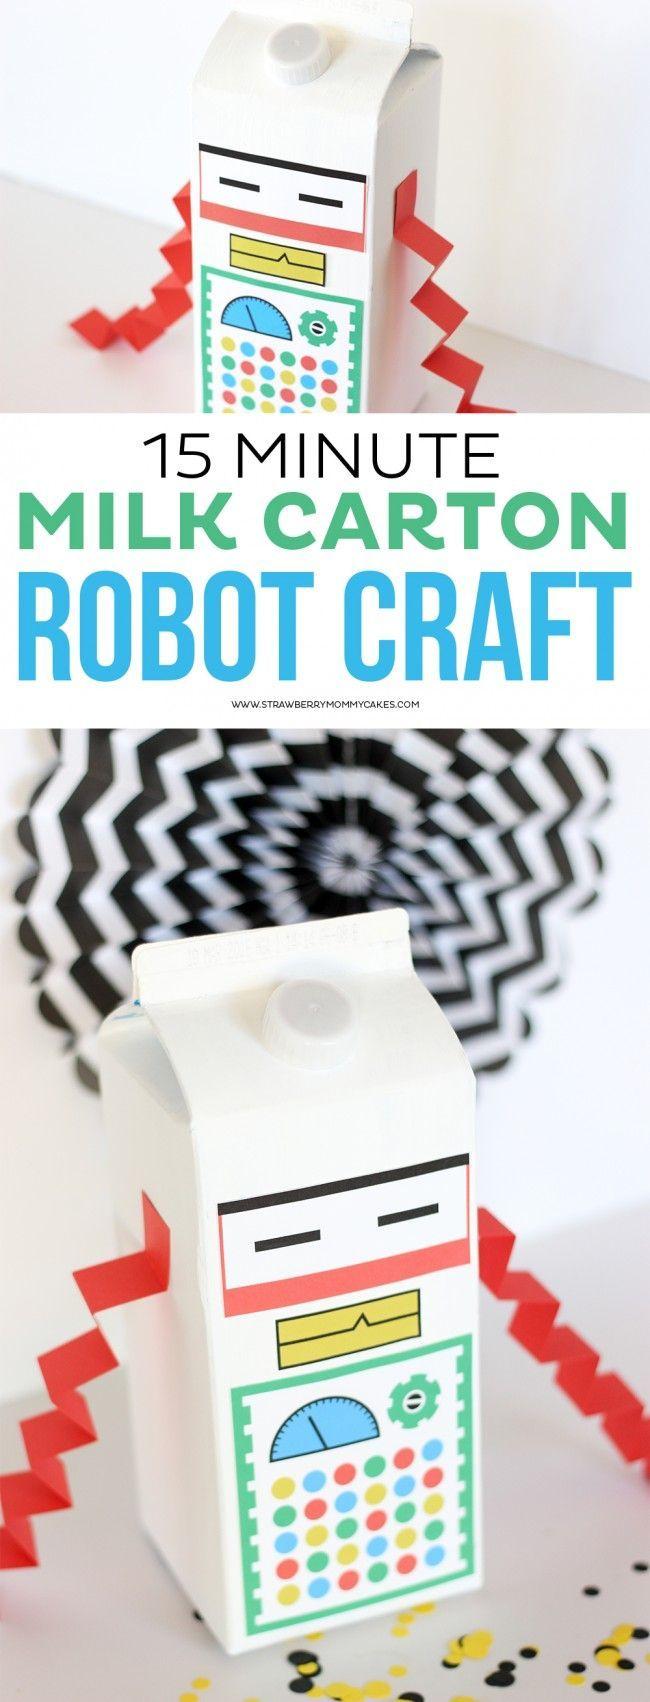 15 Minute Milk Carton Robot Craft                                                                                                                                                                                 More